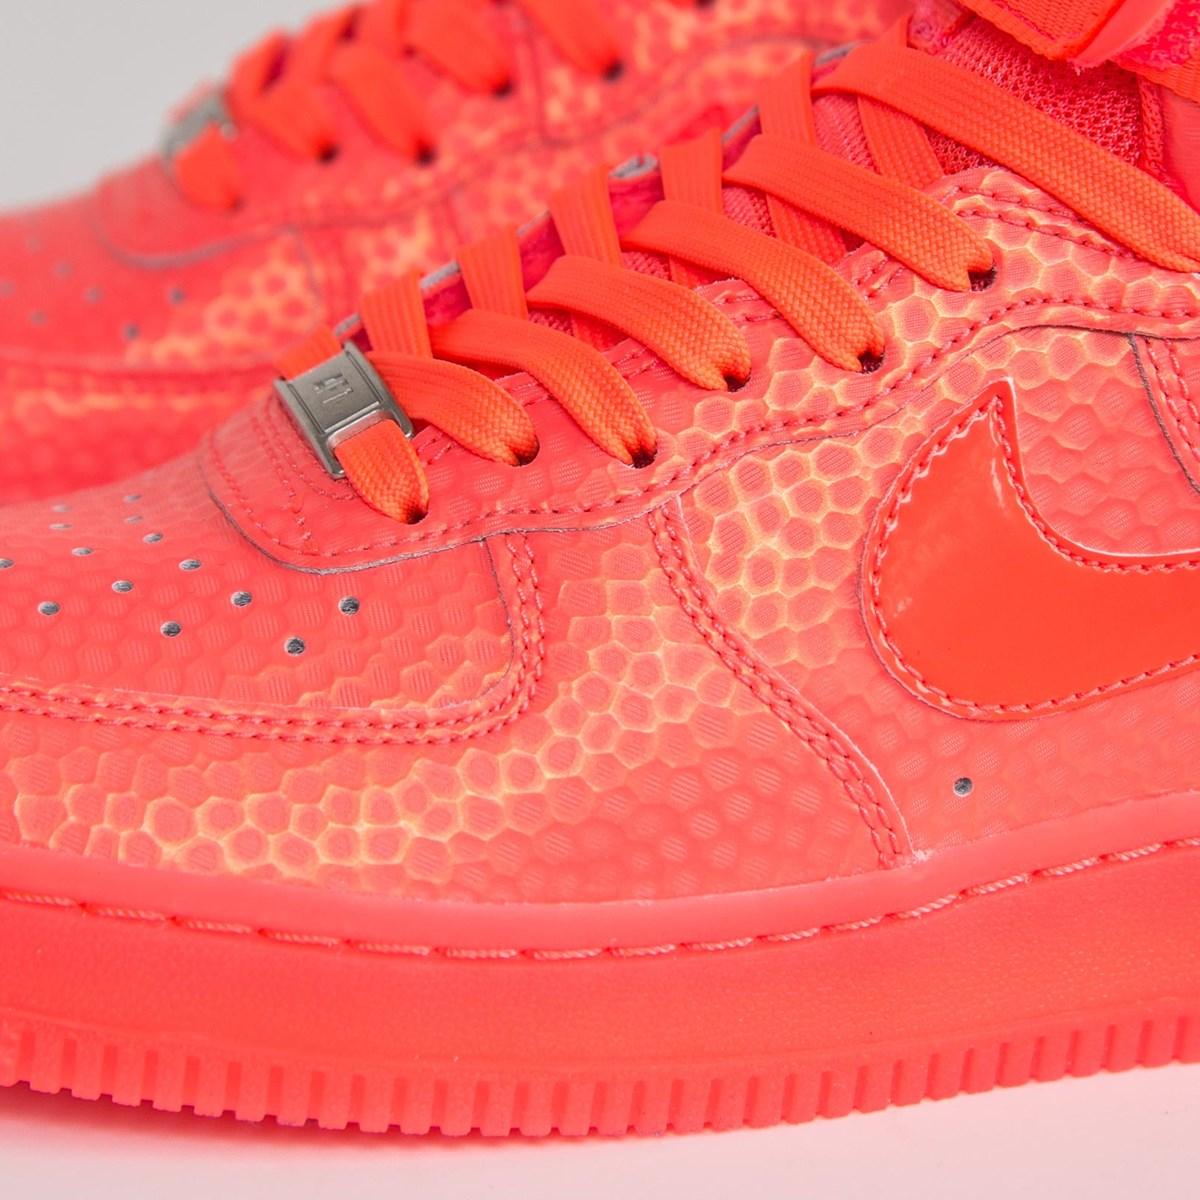 f423f8314670 Nike Wmns Air Force 1 Hi Premium - 654440-800 - Sneakersnstuff ...